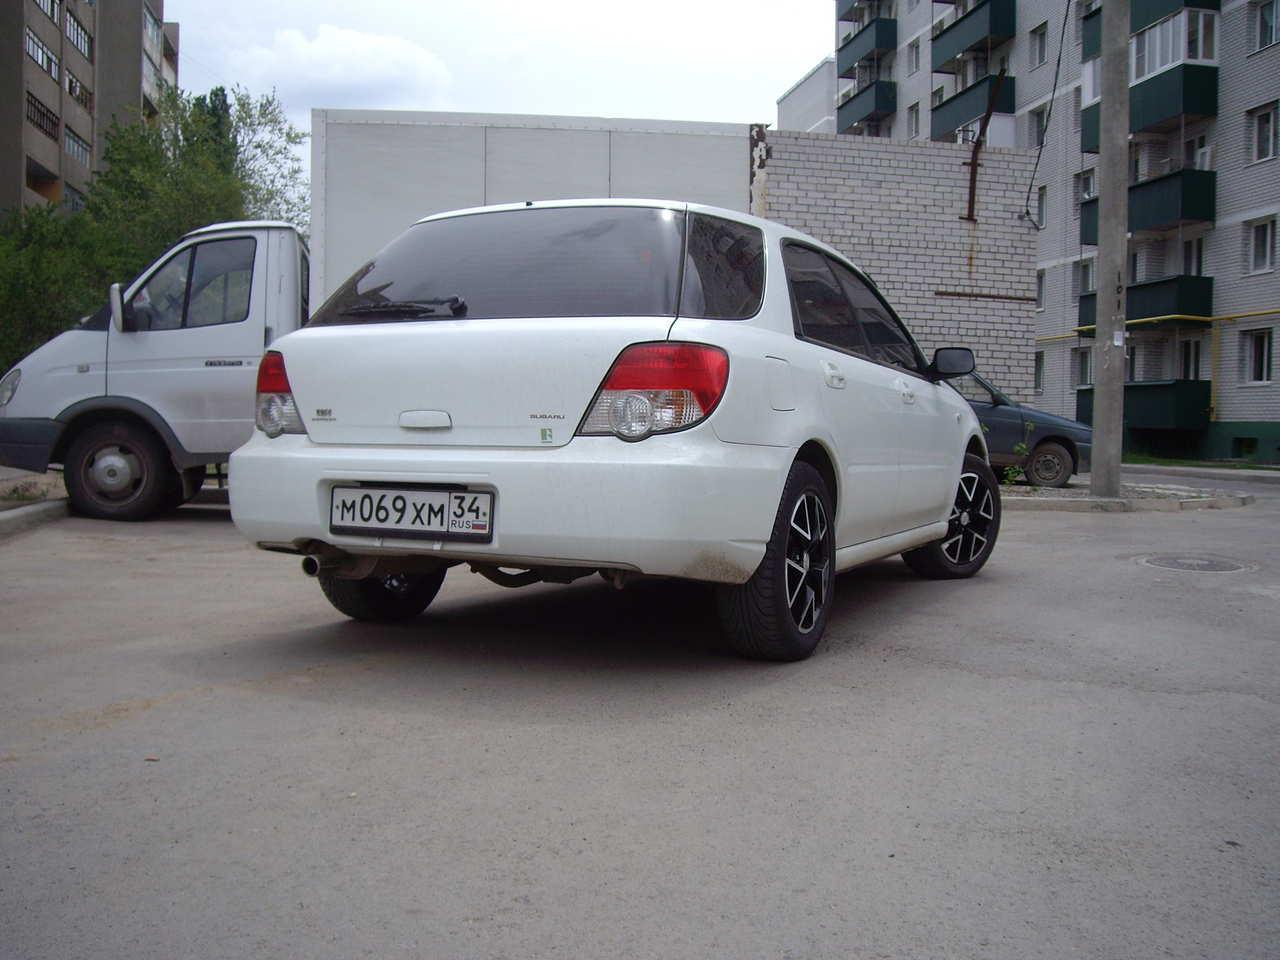 used 2003 subaru impreza wagon photos 1500cc gasoline automatic for sale. Black Bedroom Furniture Sets. Home Design Ideas